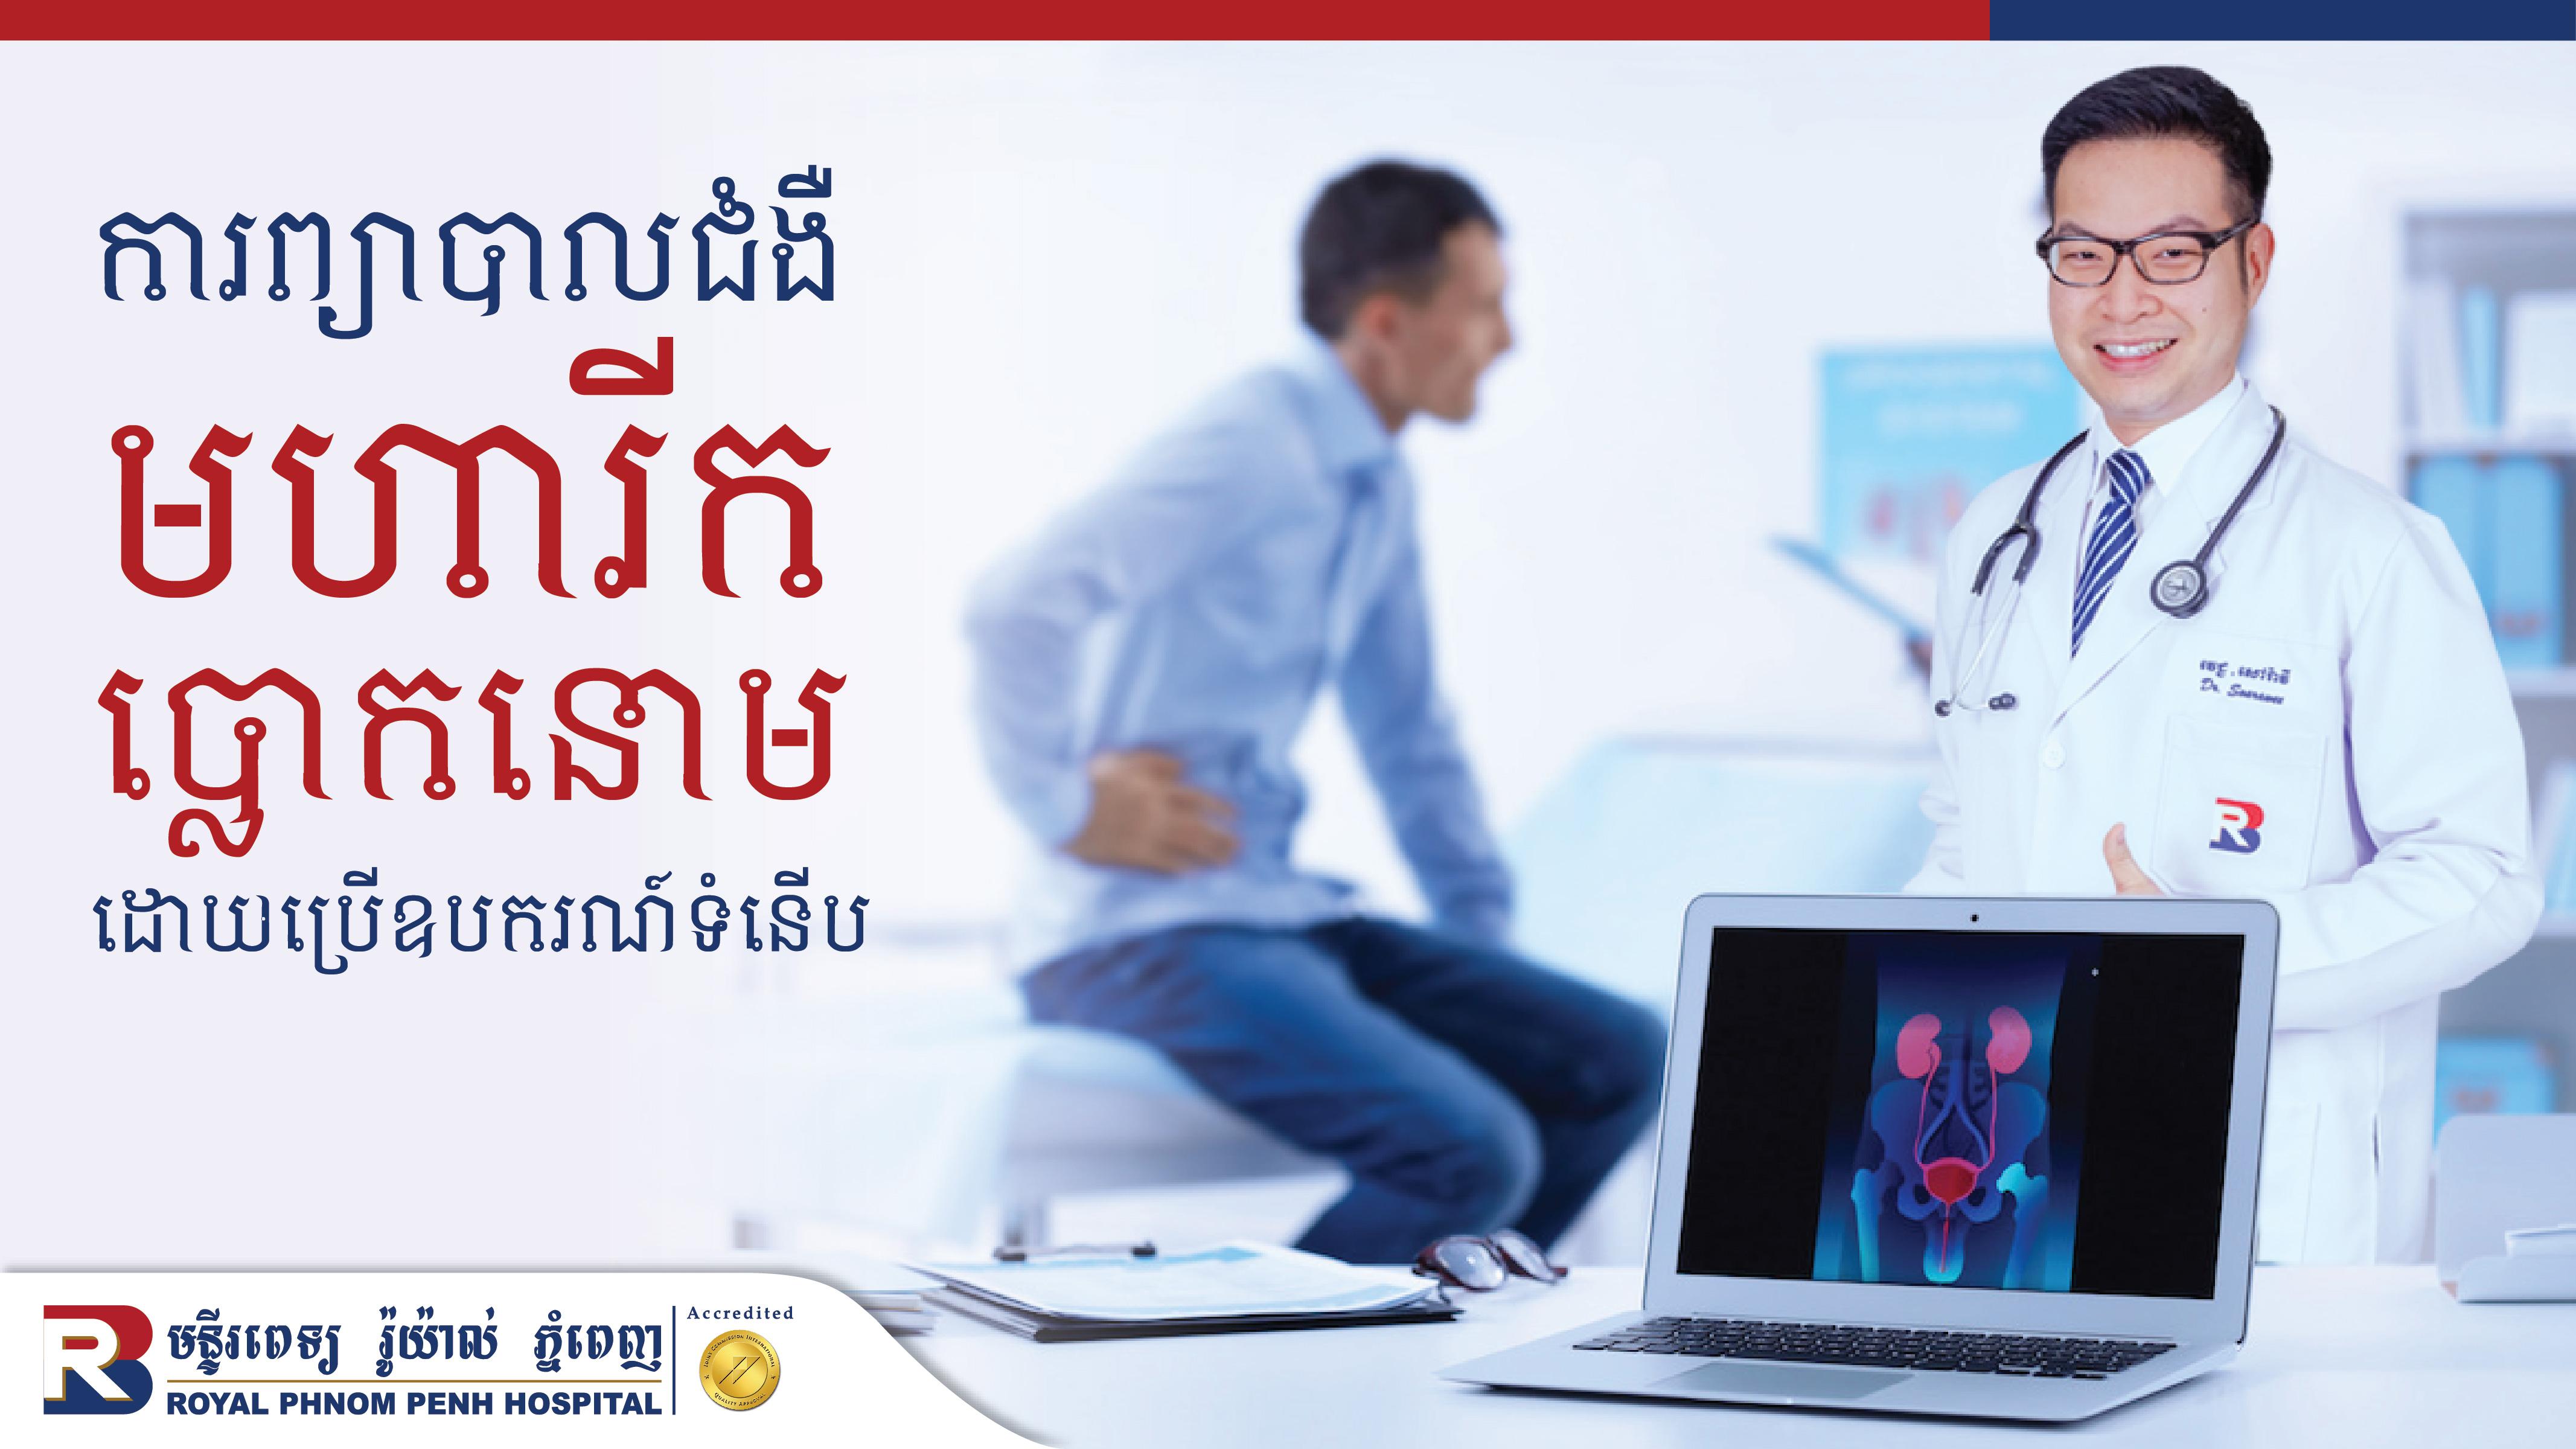 Cancer in Urology